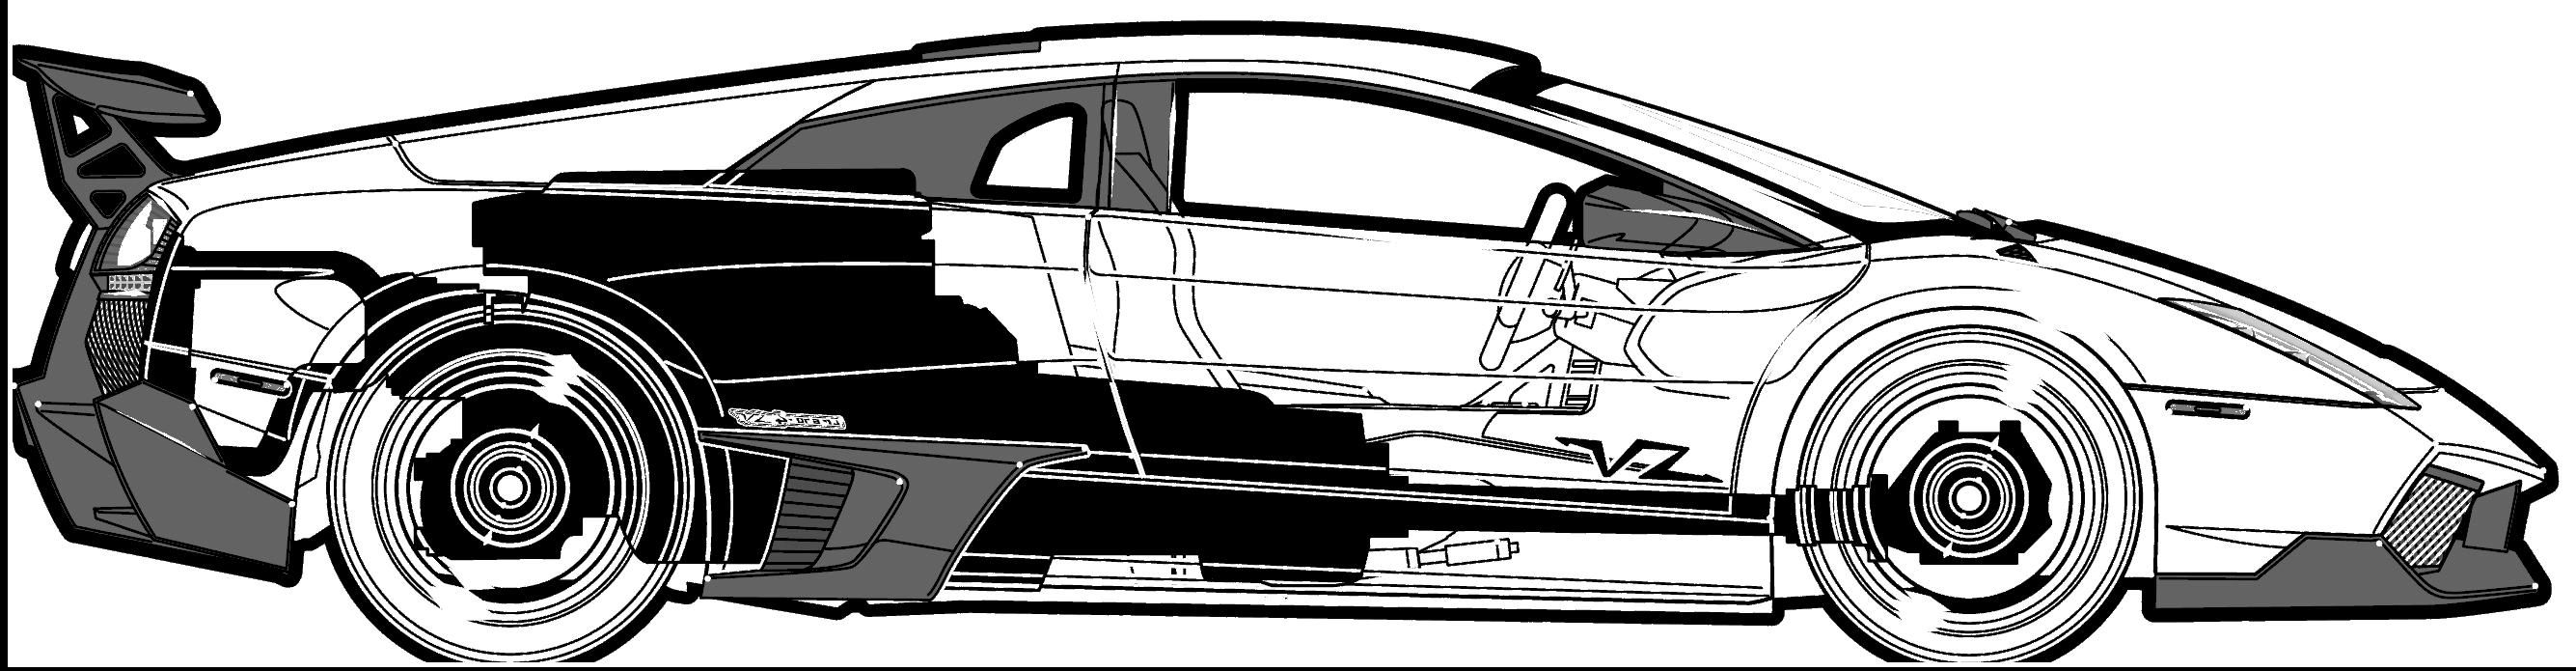 CAR blueprints - Lamborghini Murcielago LP670 Super Veloce ...